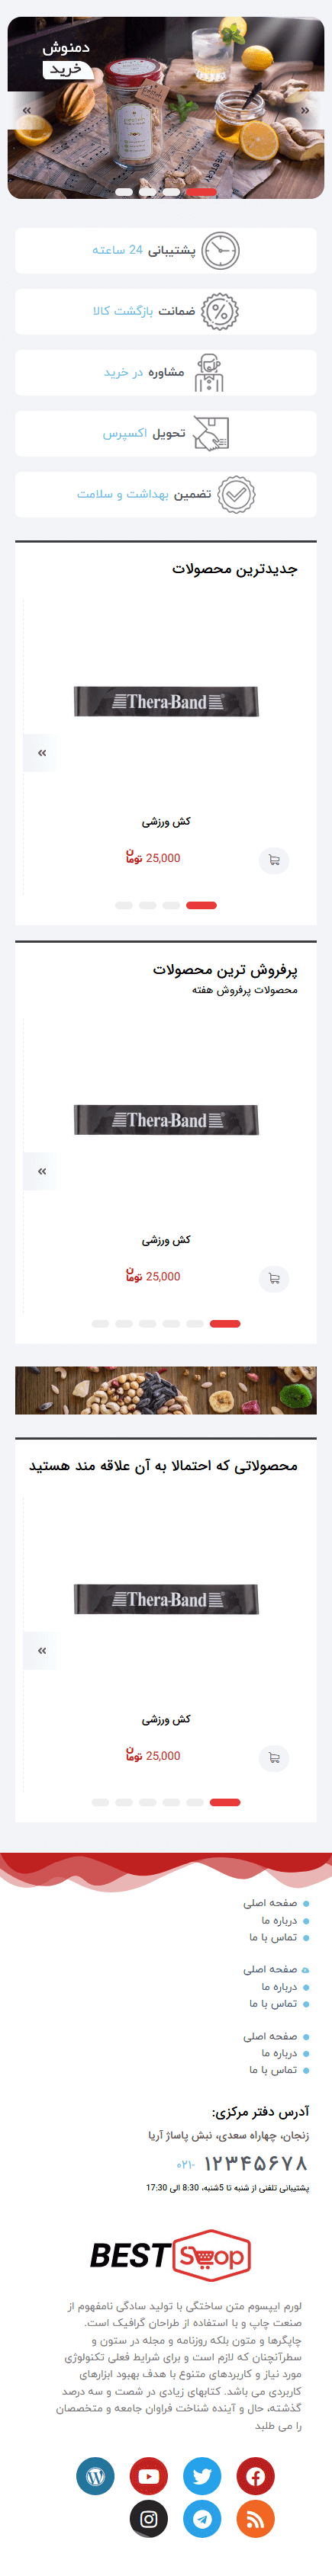 سایت best shop در حالت موبایل